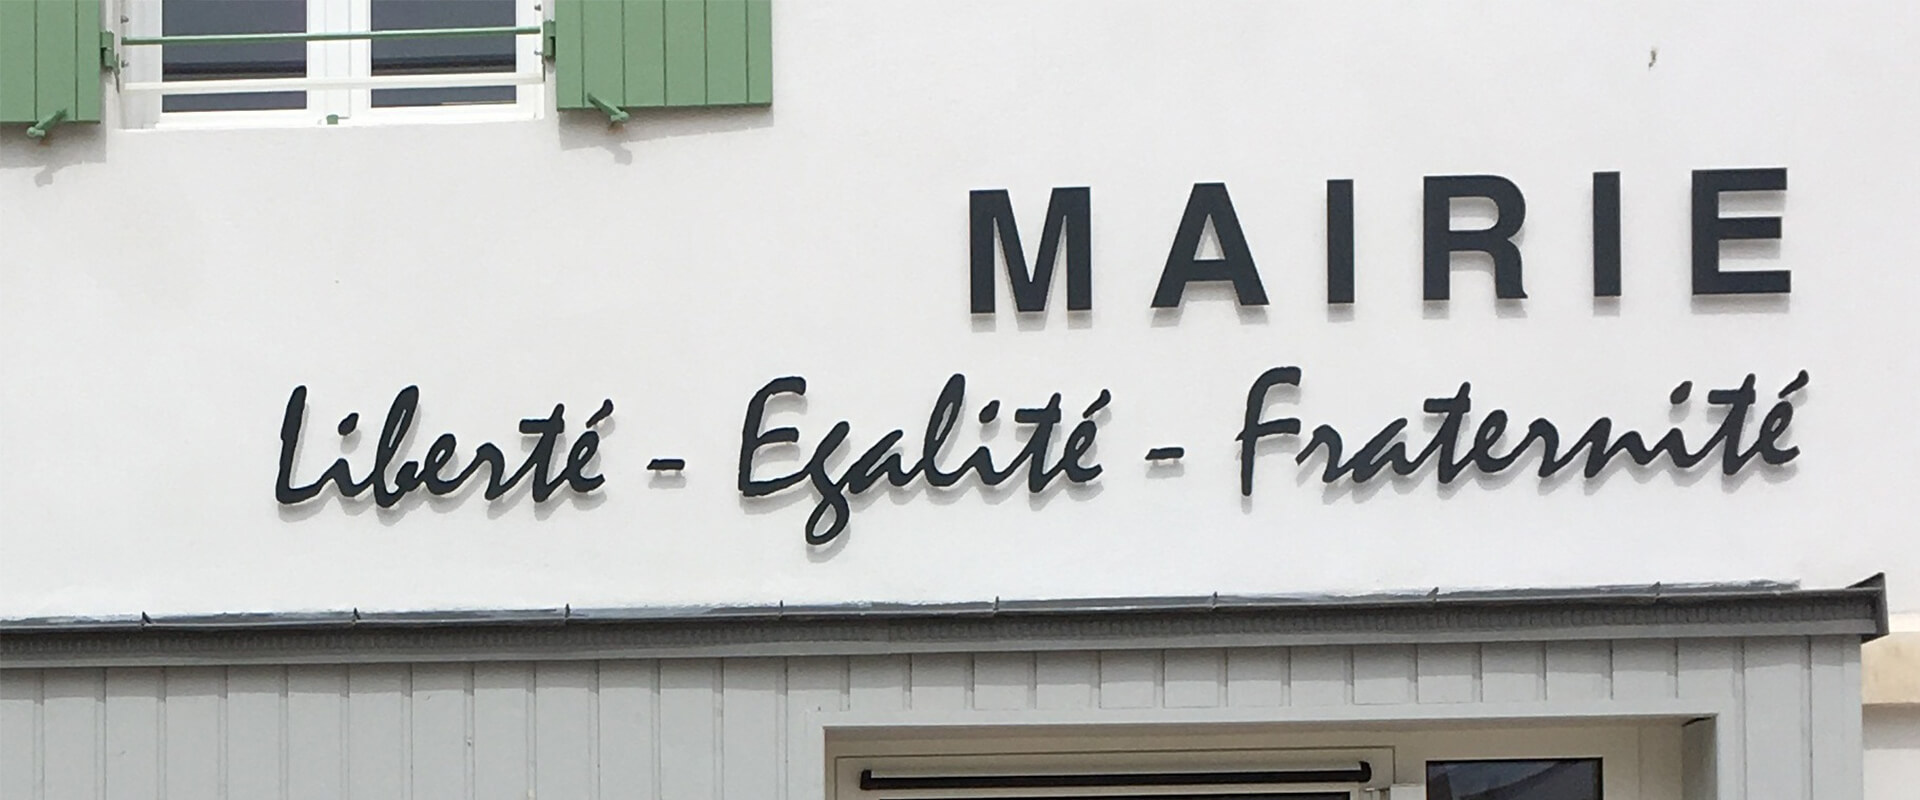 mairie-slider-perigny